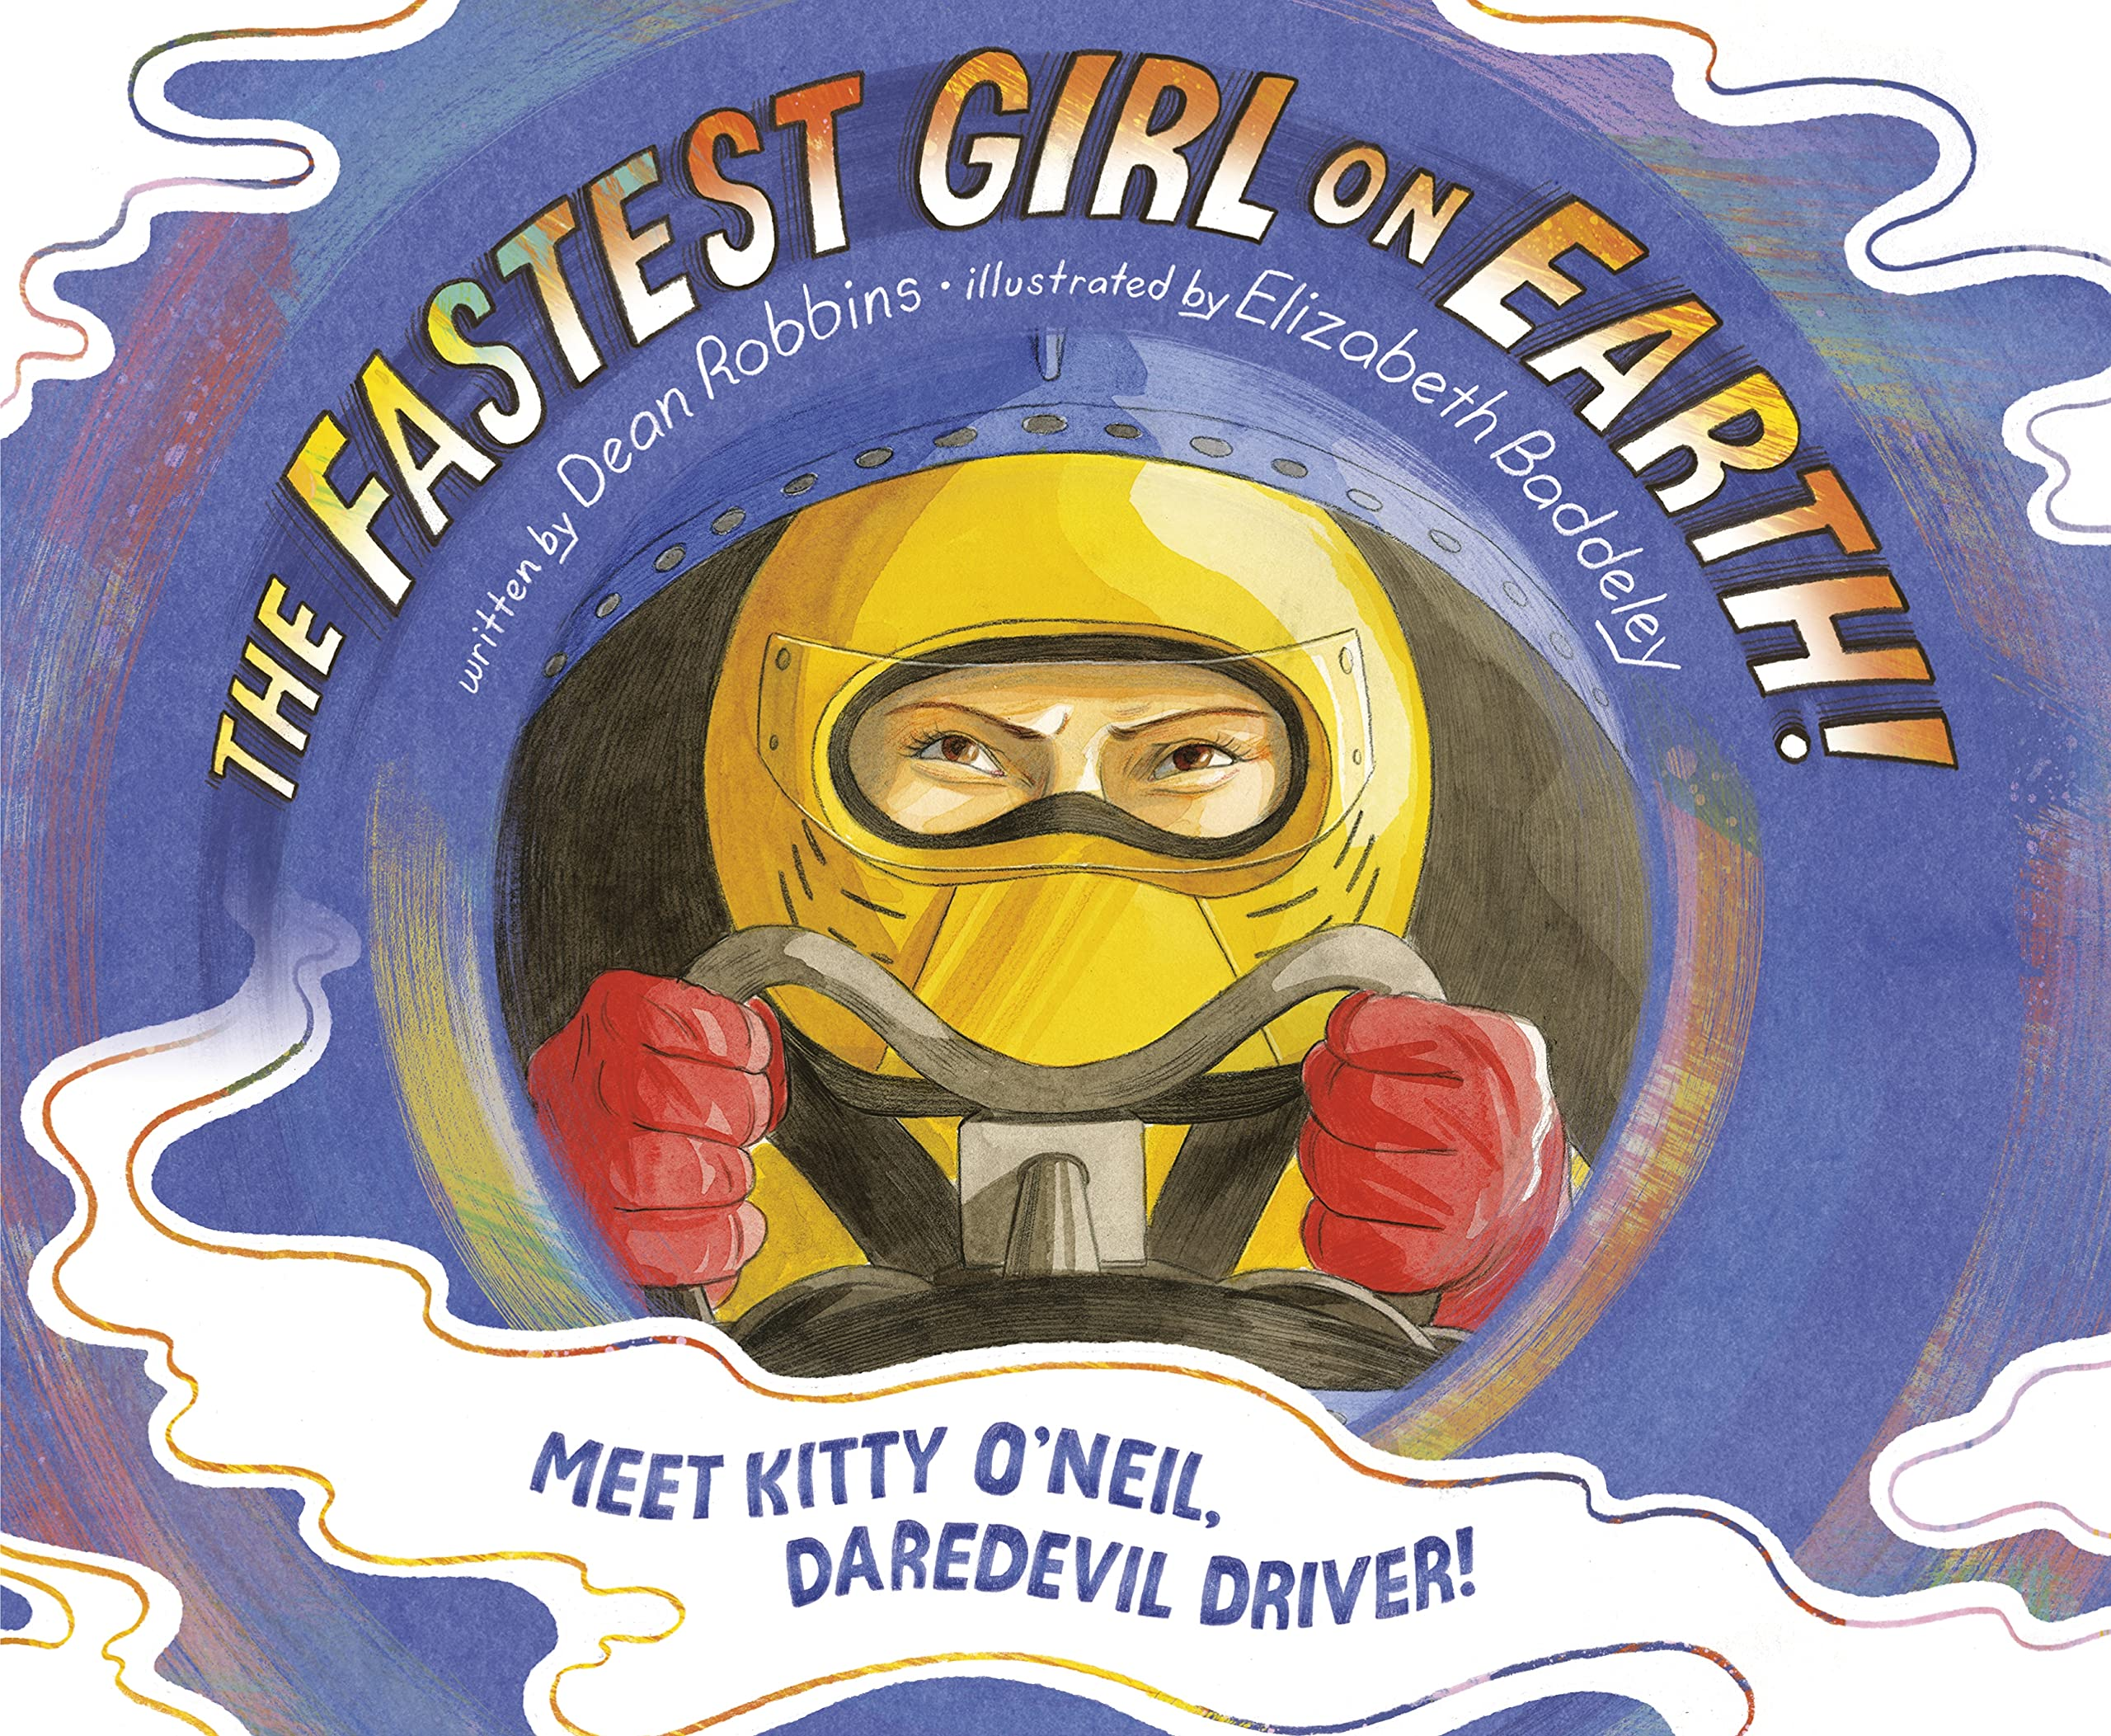 The Fastest Girl on Earth!: Meet Kitty O'Neil, Daredevil Driver!: Robbins,  Dean, Baddeley, Elizabeth: 9780593125717: Amazon.com: Books